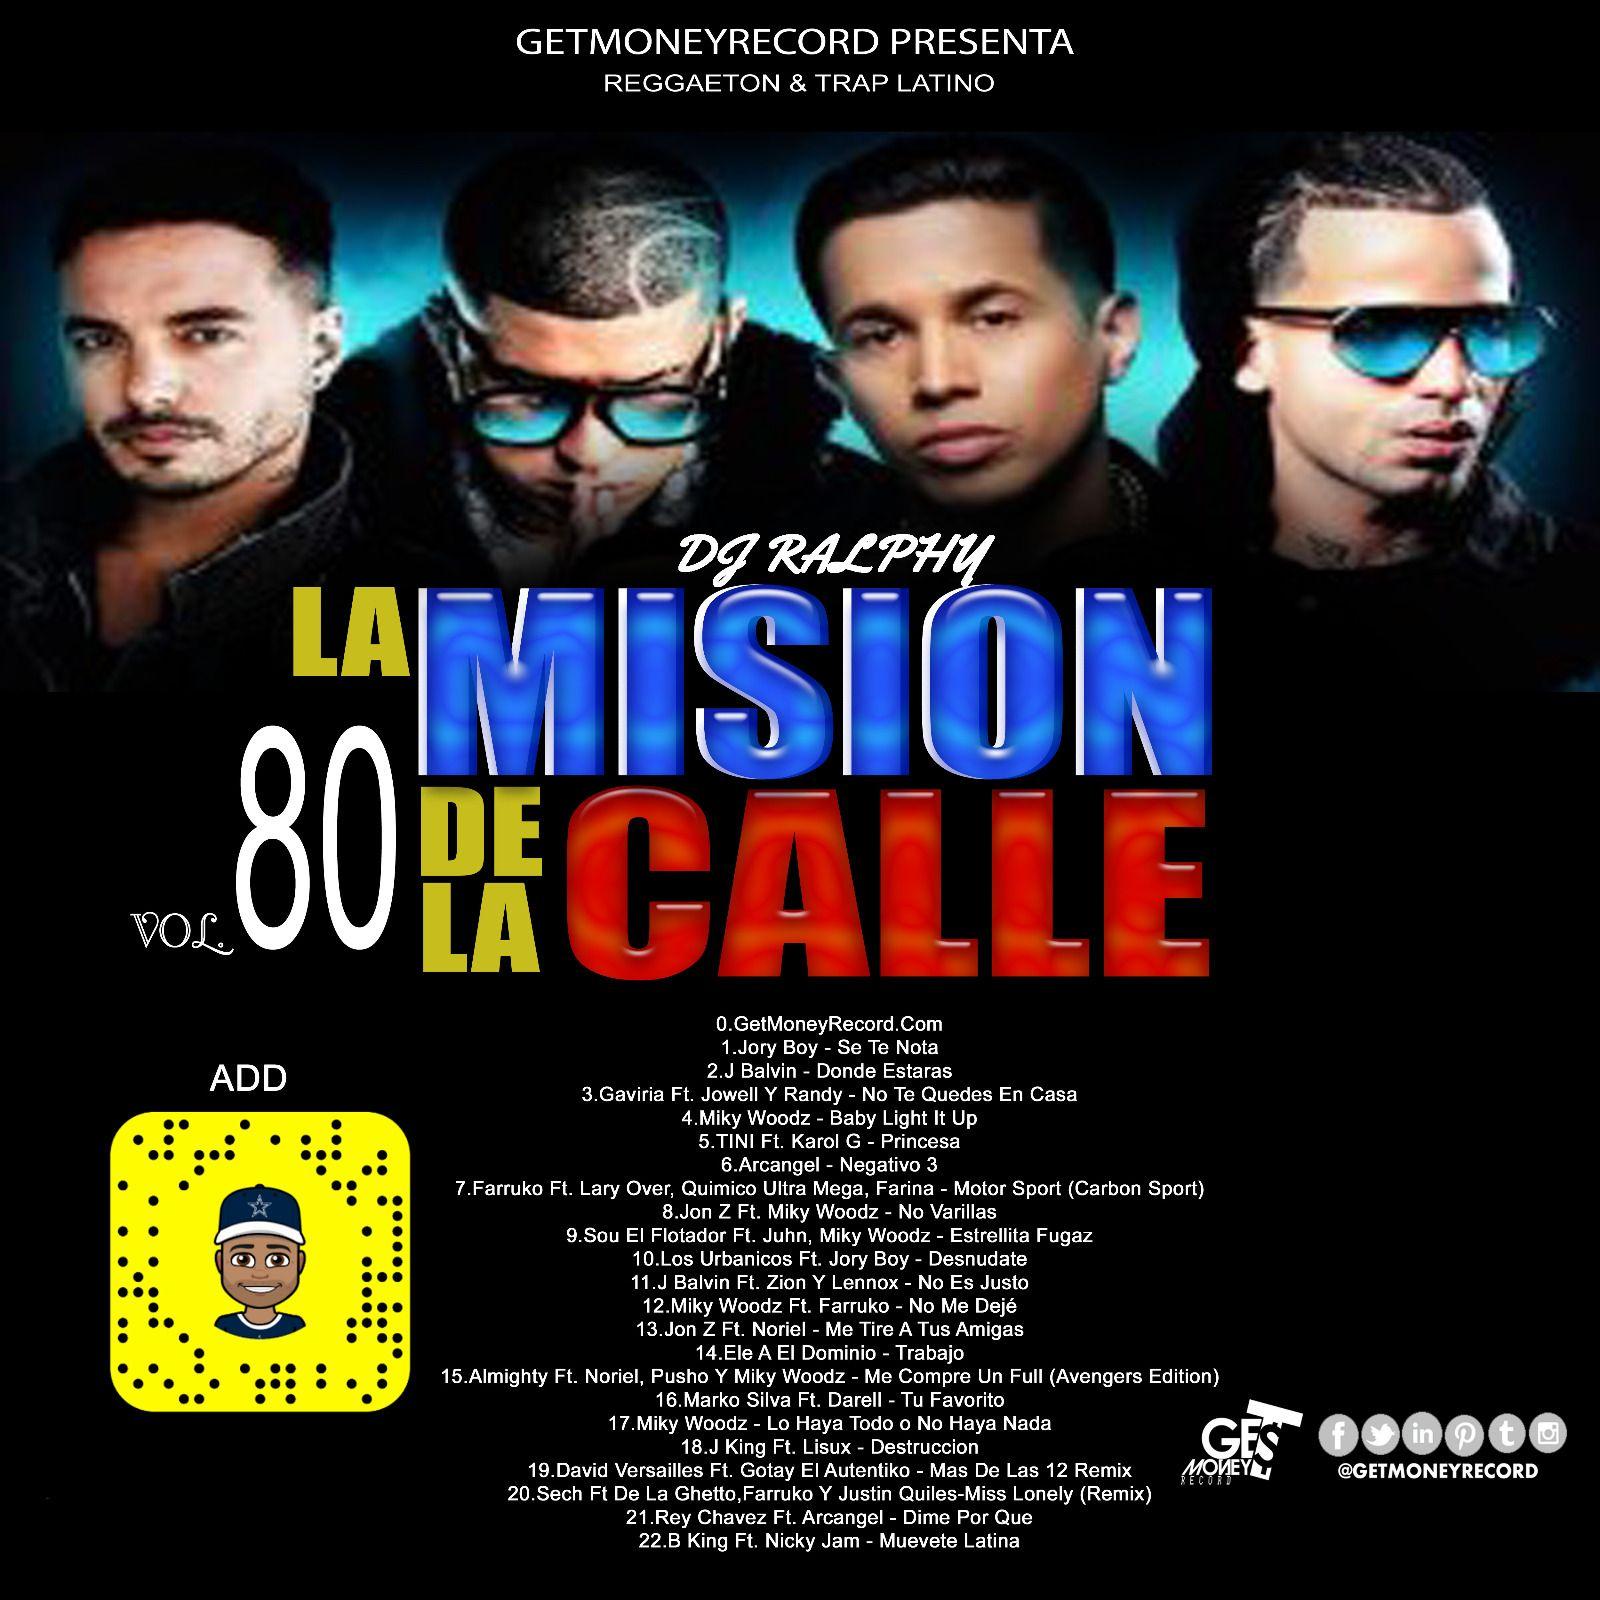 Reggaeton & Latin Trap La Mision De La Calle Vol 80 (2018) by Jory